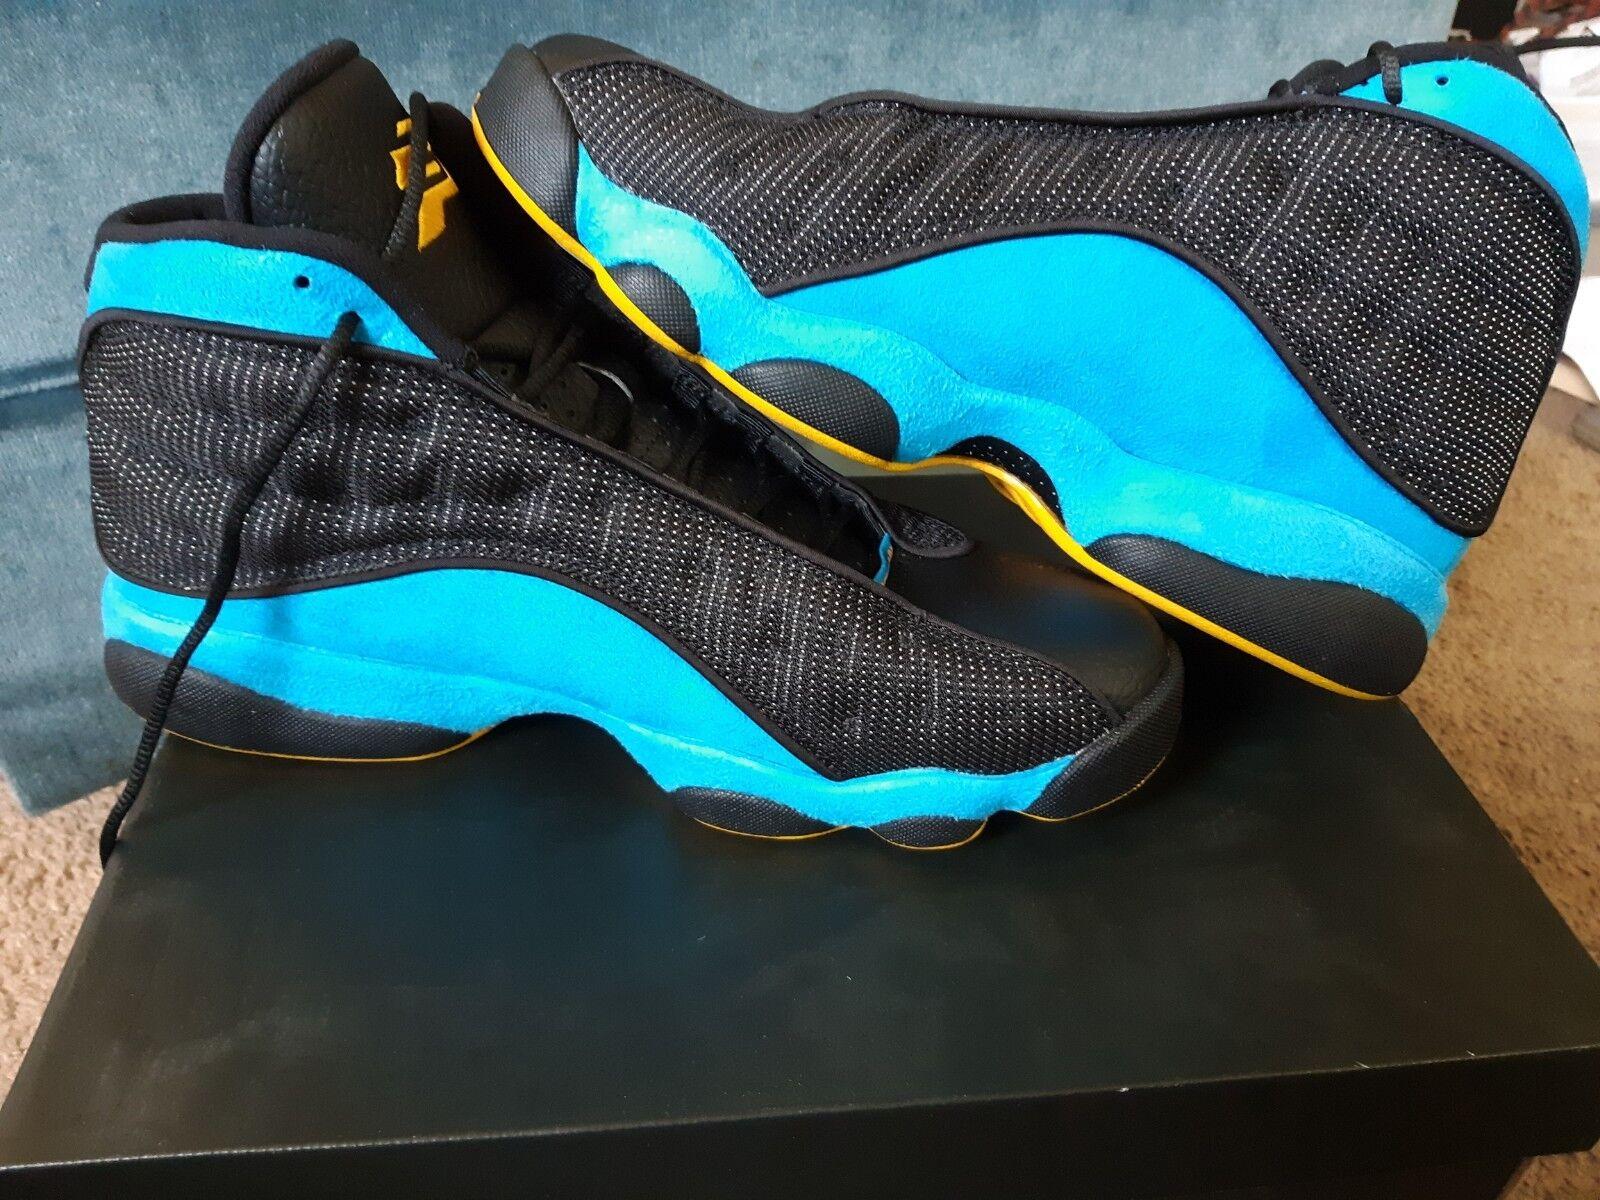 1dd2b5e82db Nike Air Jordan 13 Retro CP PE Size Paul Hornets Black bluee 823902-015  Chris 9.5 nxpdai1856-Athletic Shoes